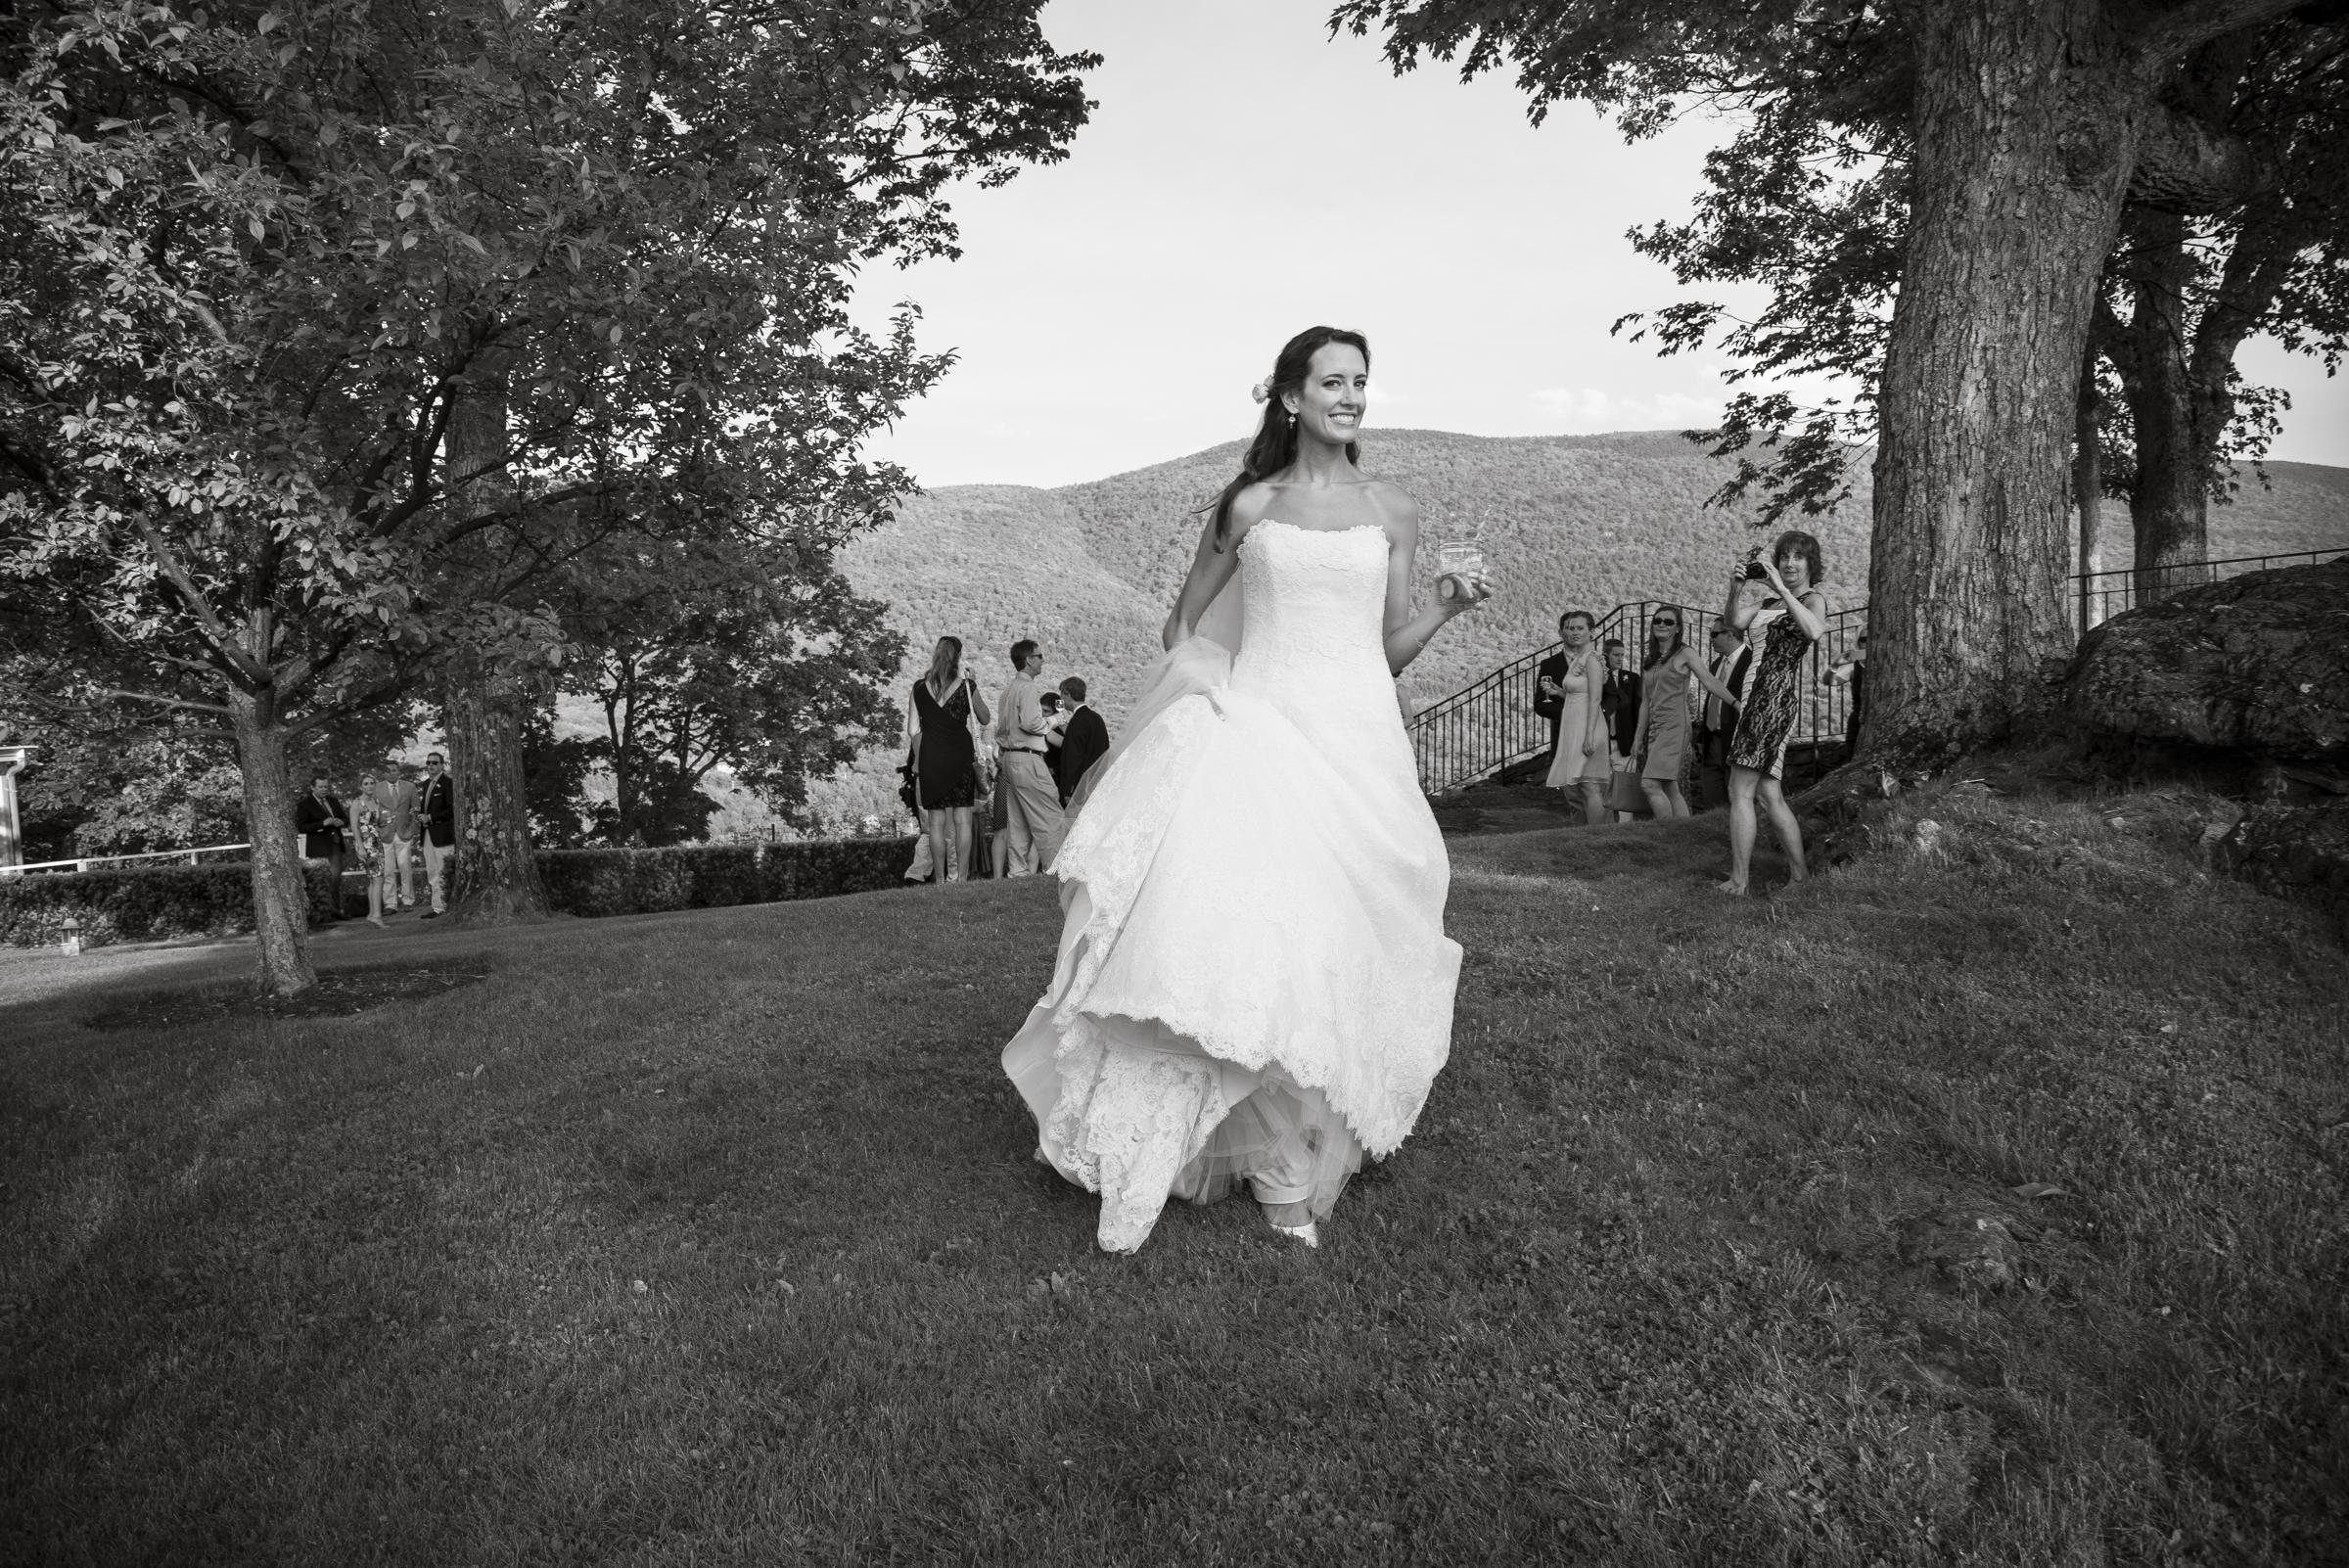 06012013-LizJeremiah-JuliaLuckettPhotography-58